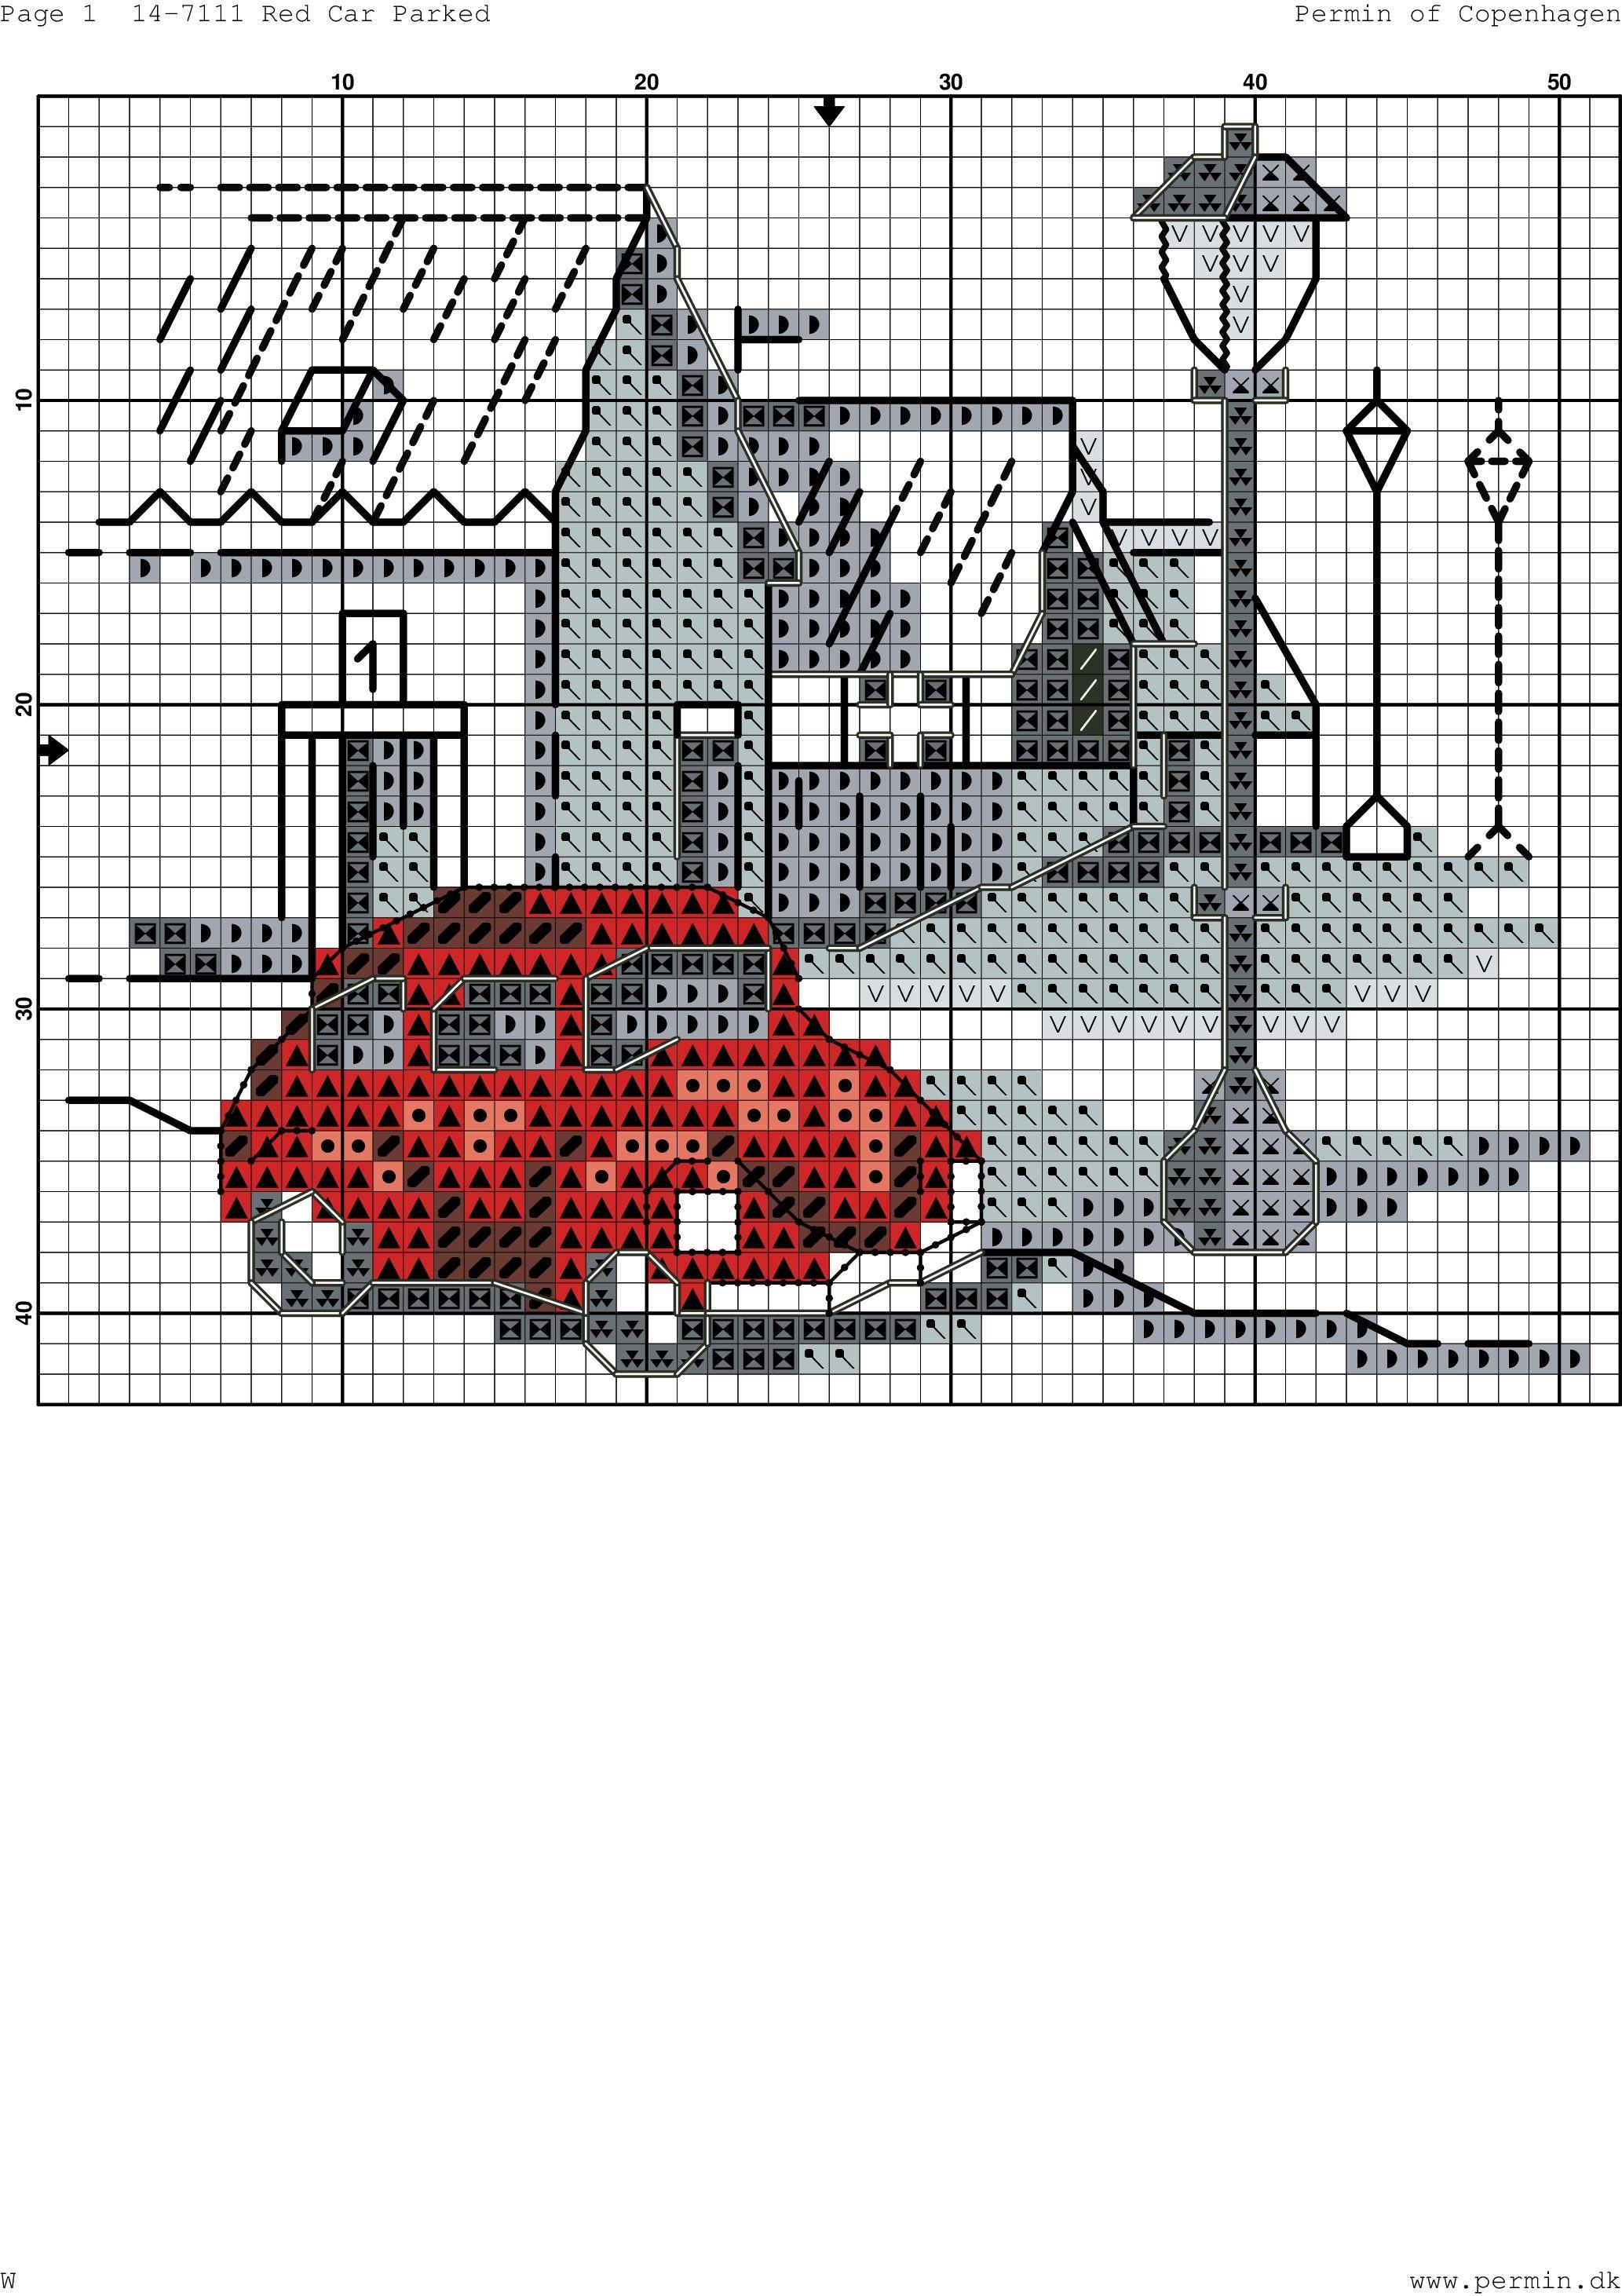 Red_Car_Parked-001.jpg 2,066×2,924 píxeles | Mis puntos 2 ...